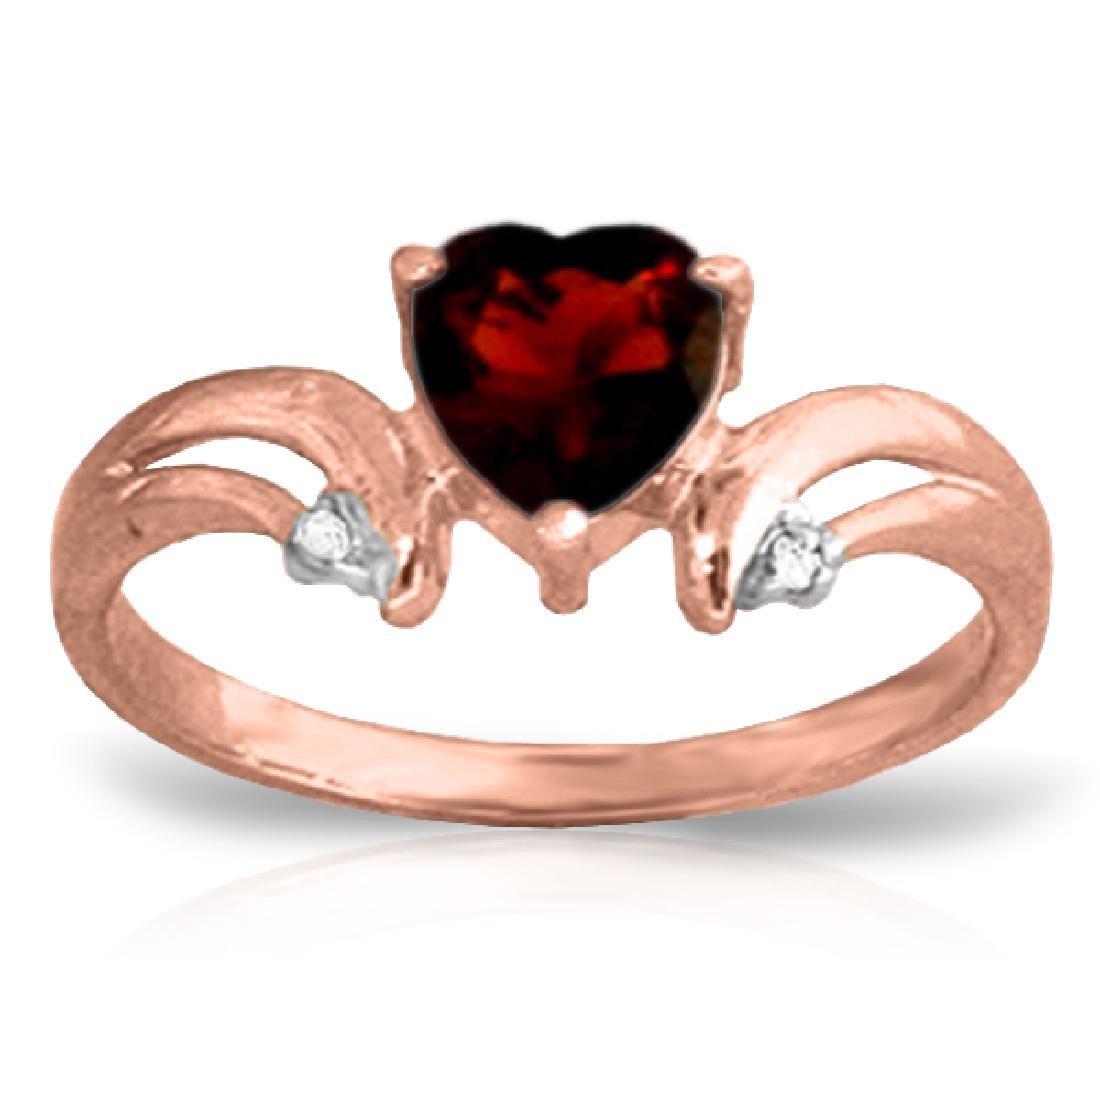 Genuine 1.26 ctw Garnet & Diamond Ring Jewelry 14KT